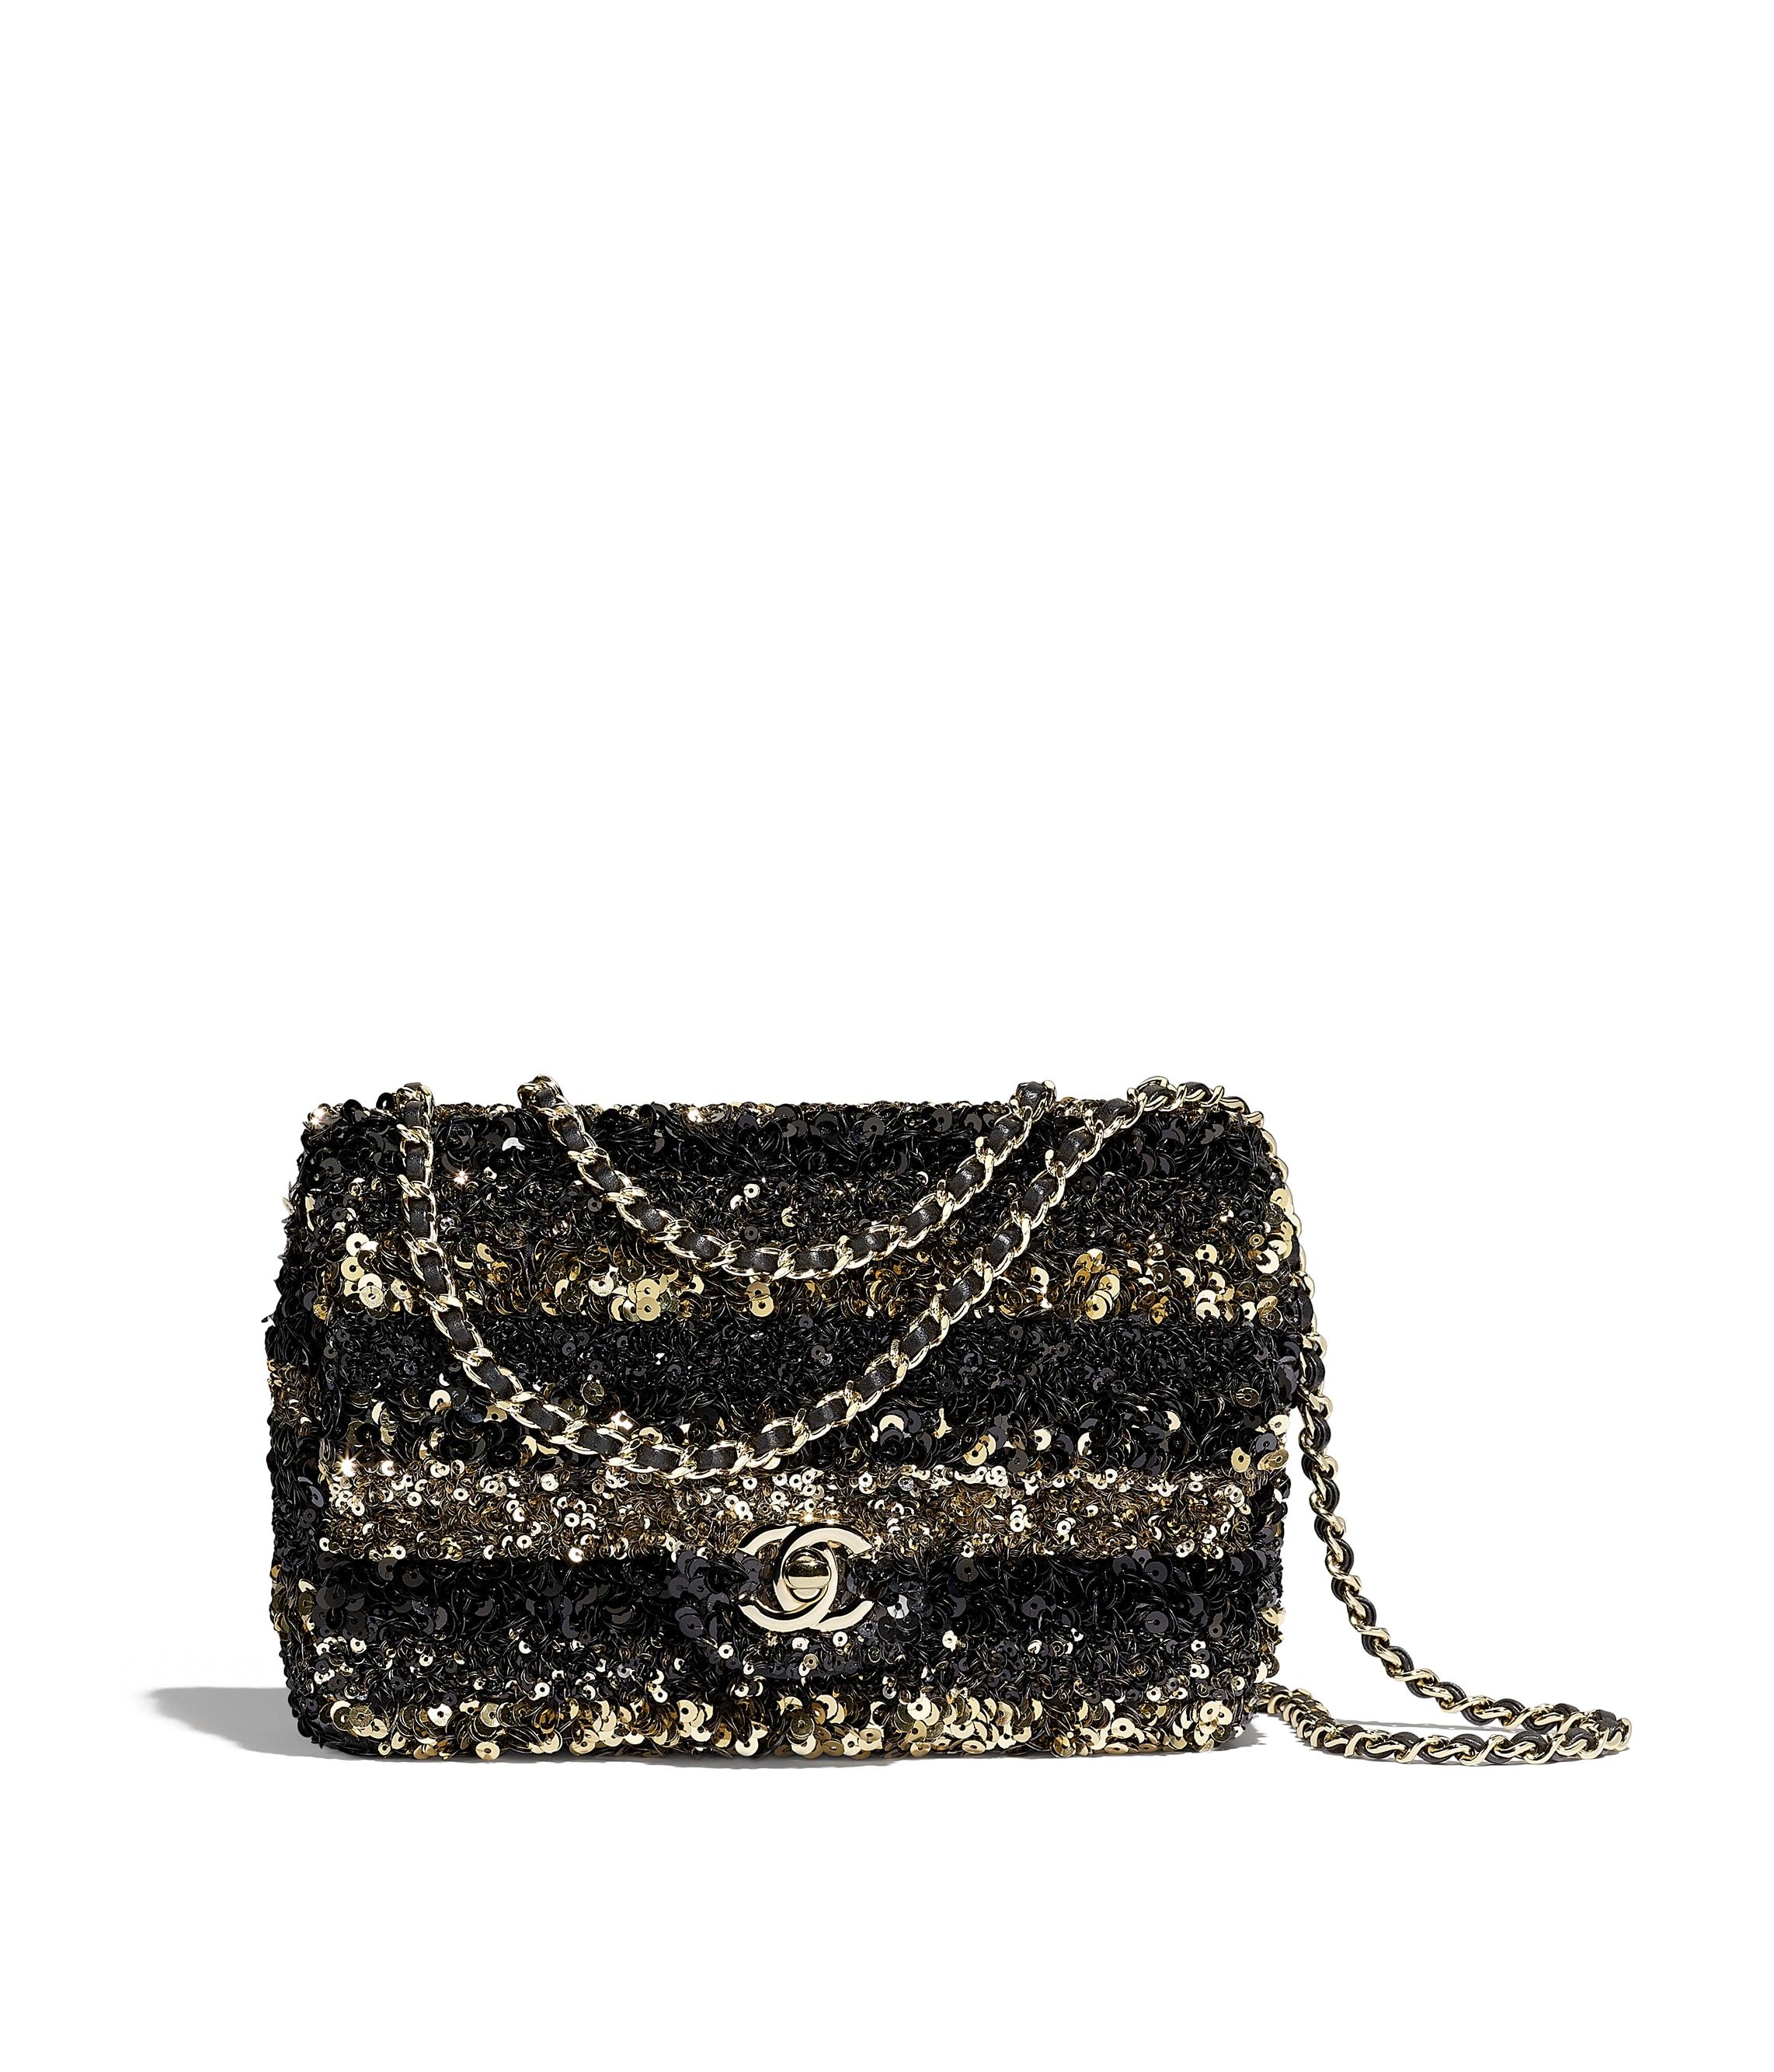 981645560a15 Flap Bag, sequins & gold-tone metal, gold & black - CHANEL